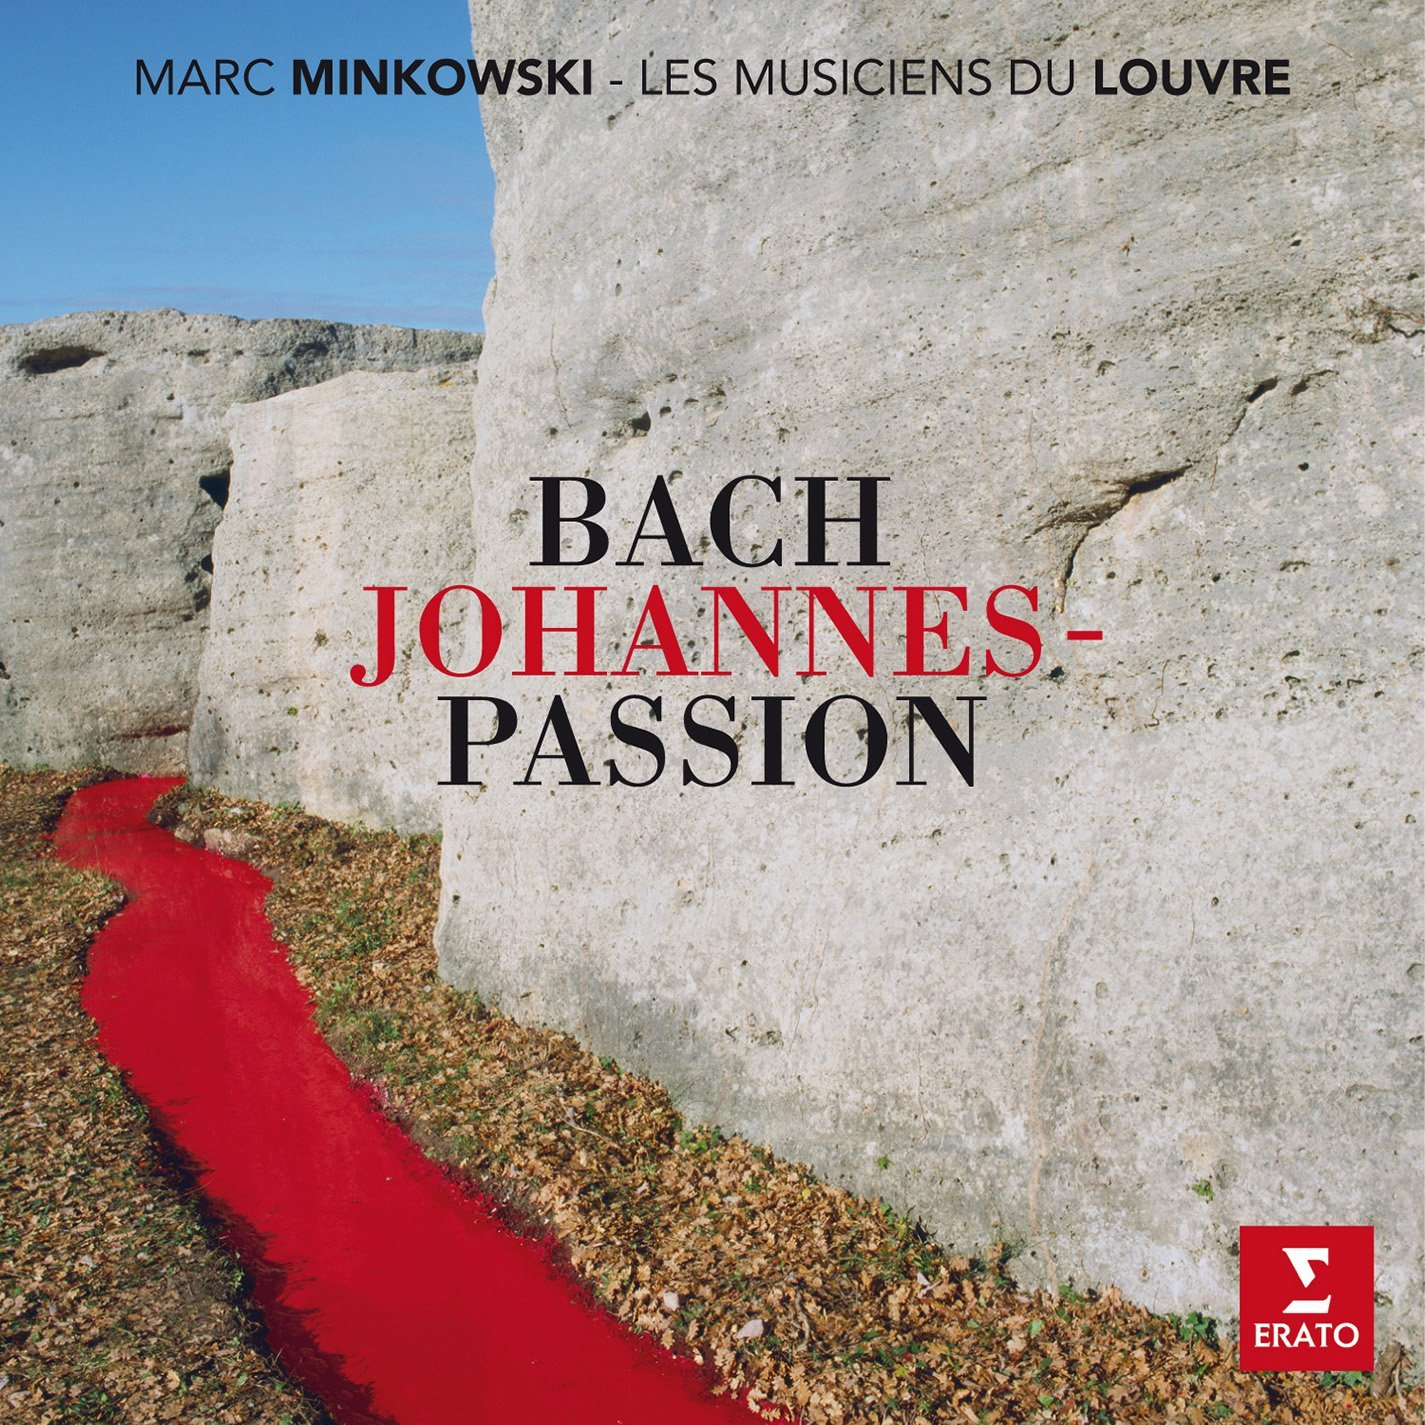 lLothar Odinius Bach Johannes Passion-Marc Minkowski